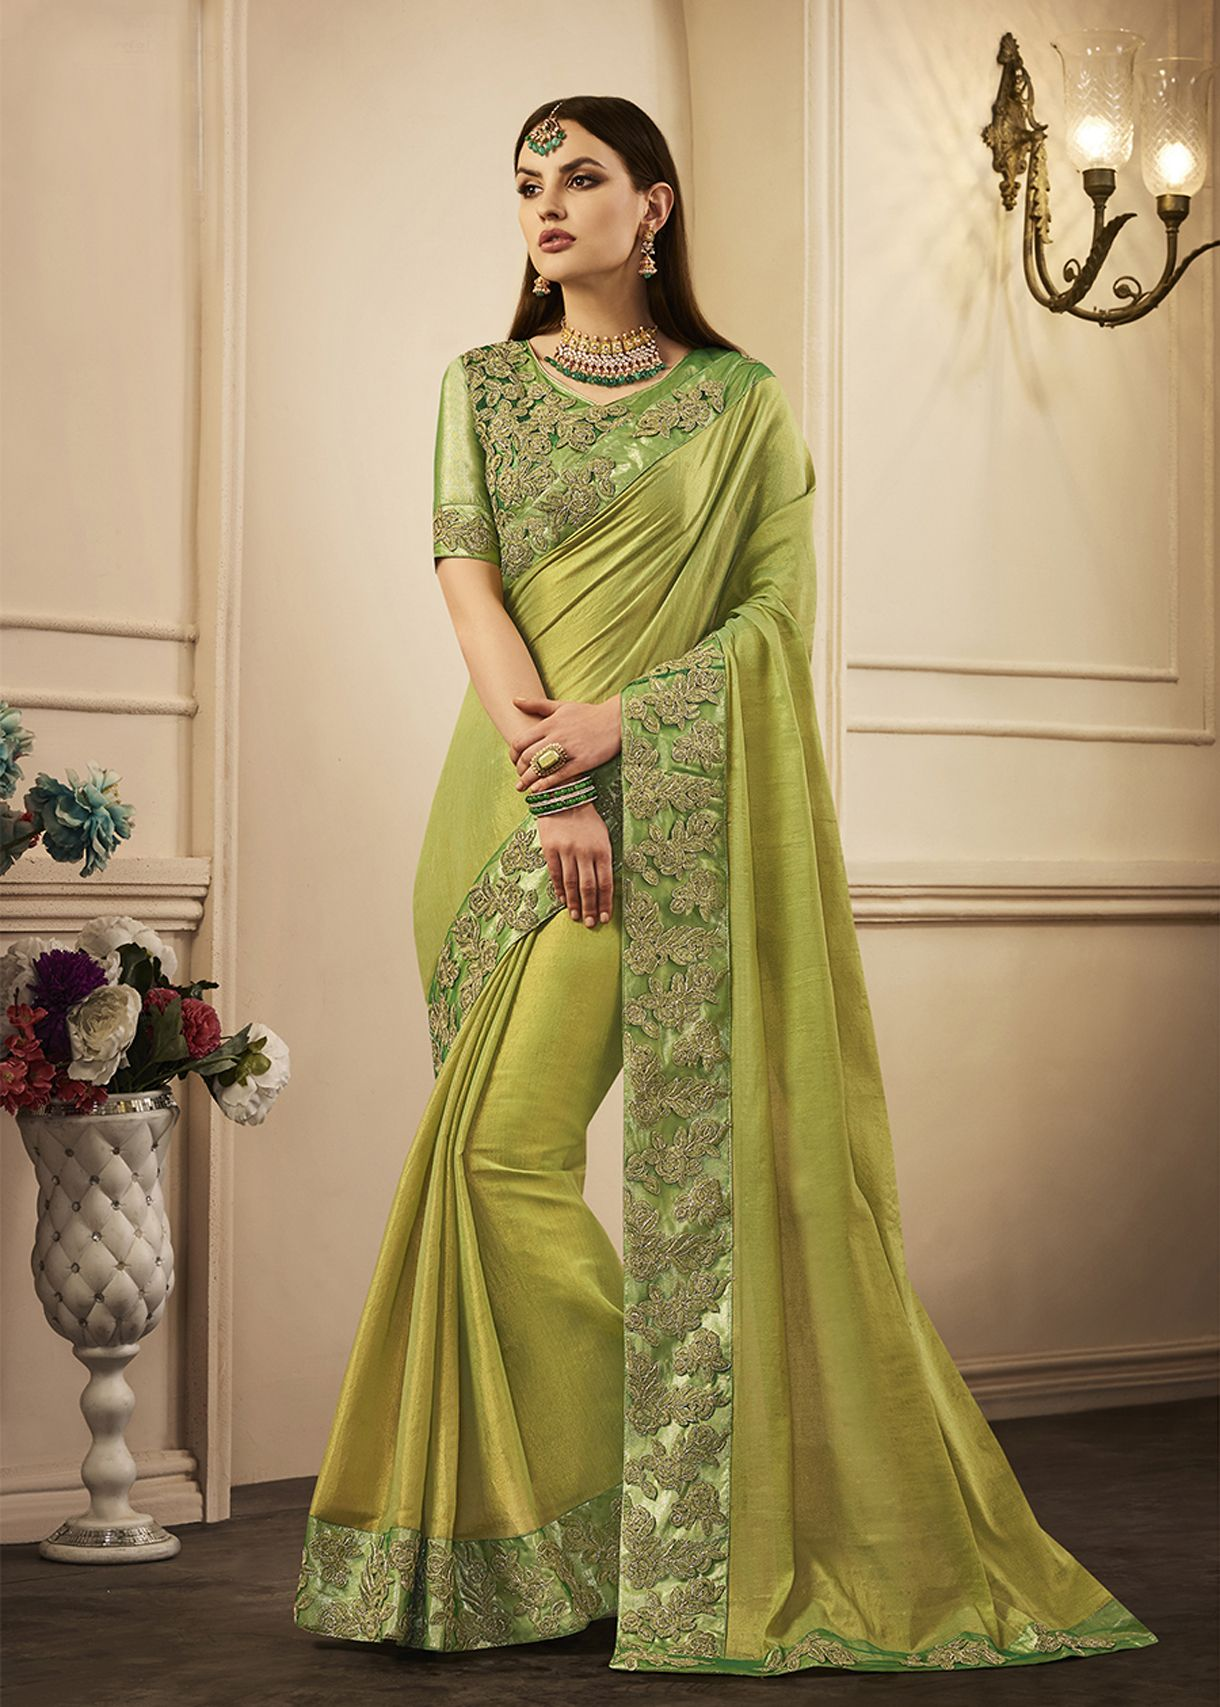 13b12754f9ed Designer Partywear Saree. #green #greensaree #ethnic #saree #2018 #partywear  #partywearsaree #wedding #weddingsaree #weddingclothes #fashion #outfit ...